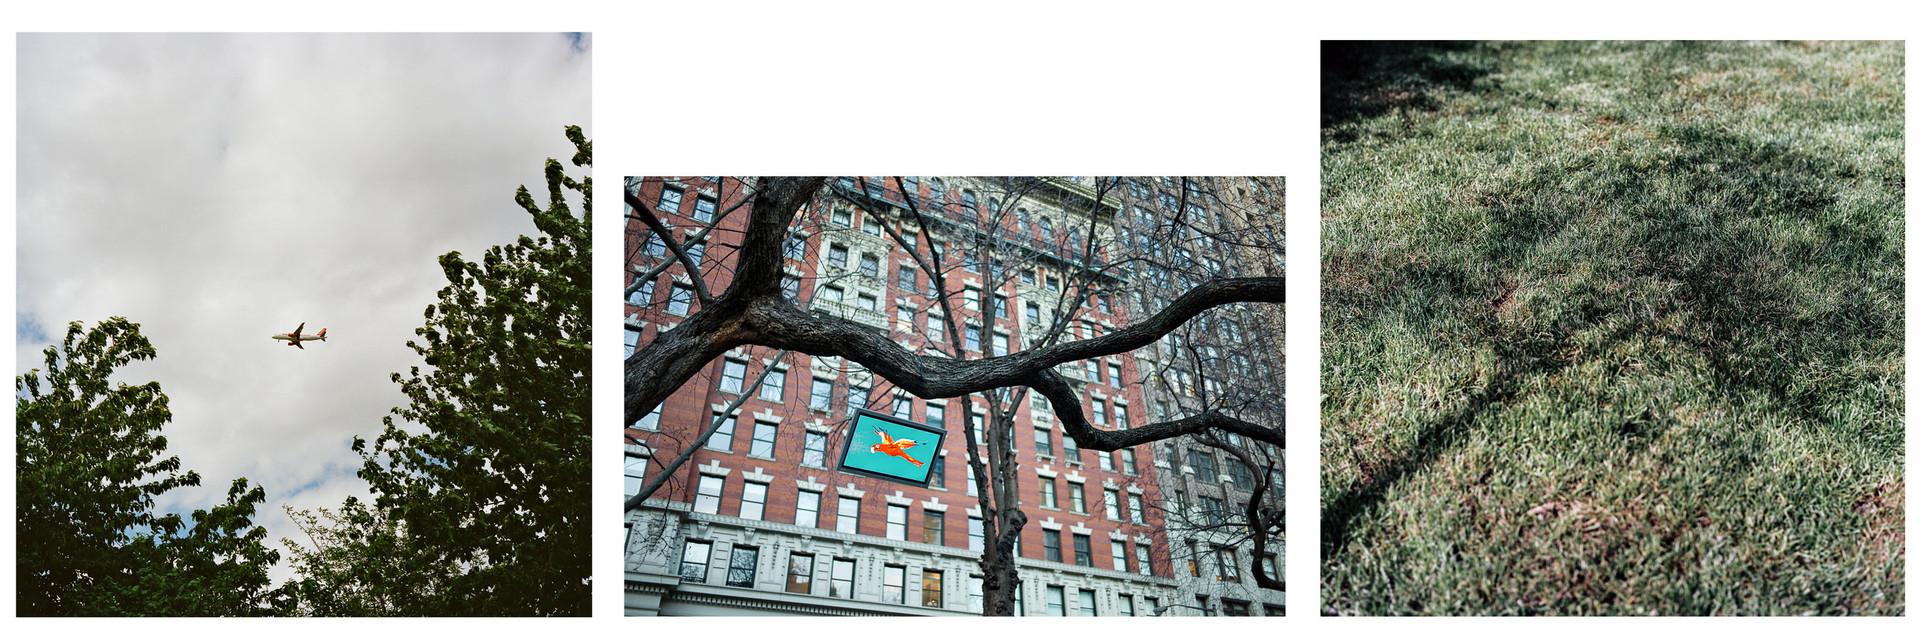 Green City - L'empreinte carbone - Carbon Footprint